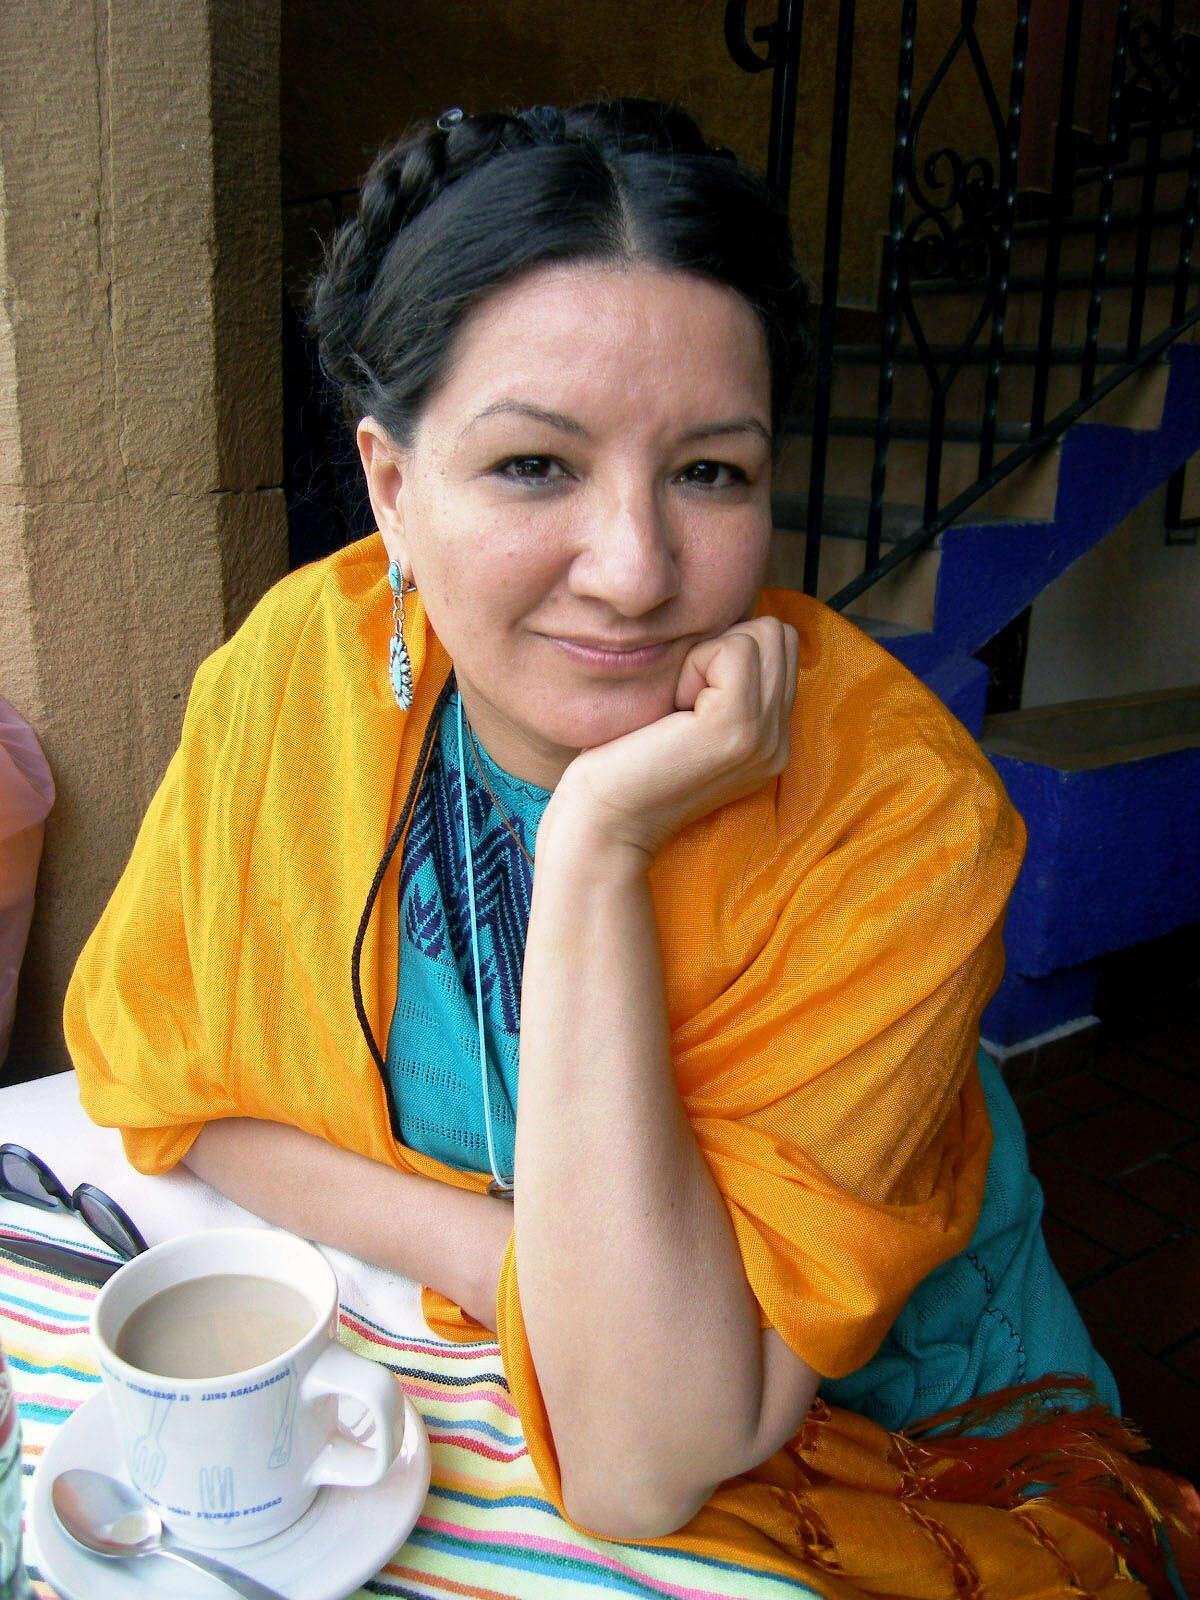 Sandra Cisneros. With